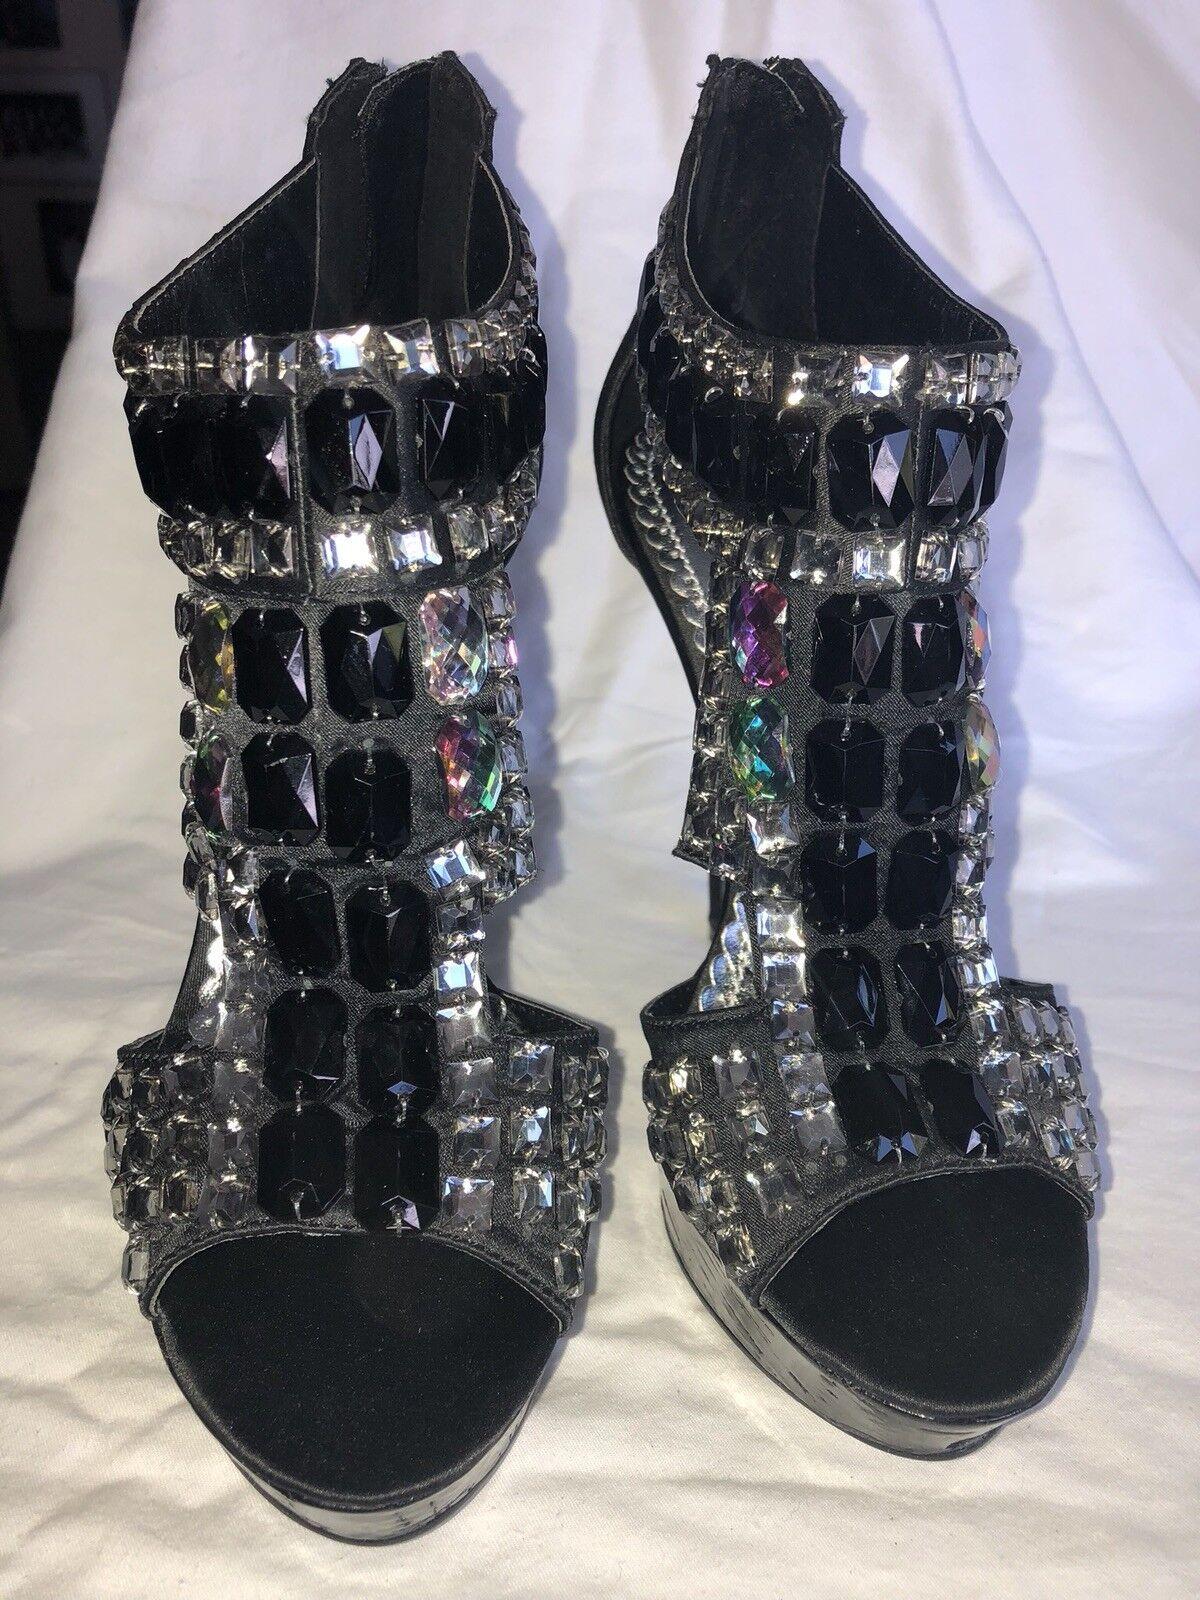 Naughty Monkey Monkey Monkey Black Patent Learher shoes Sz 7 9c203b